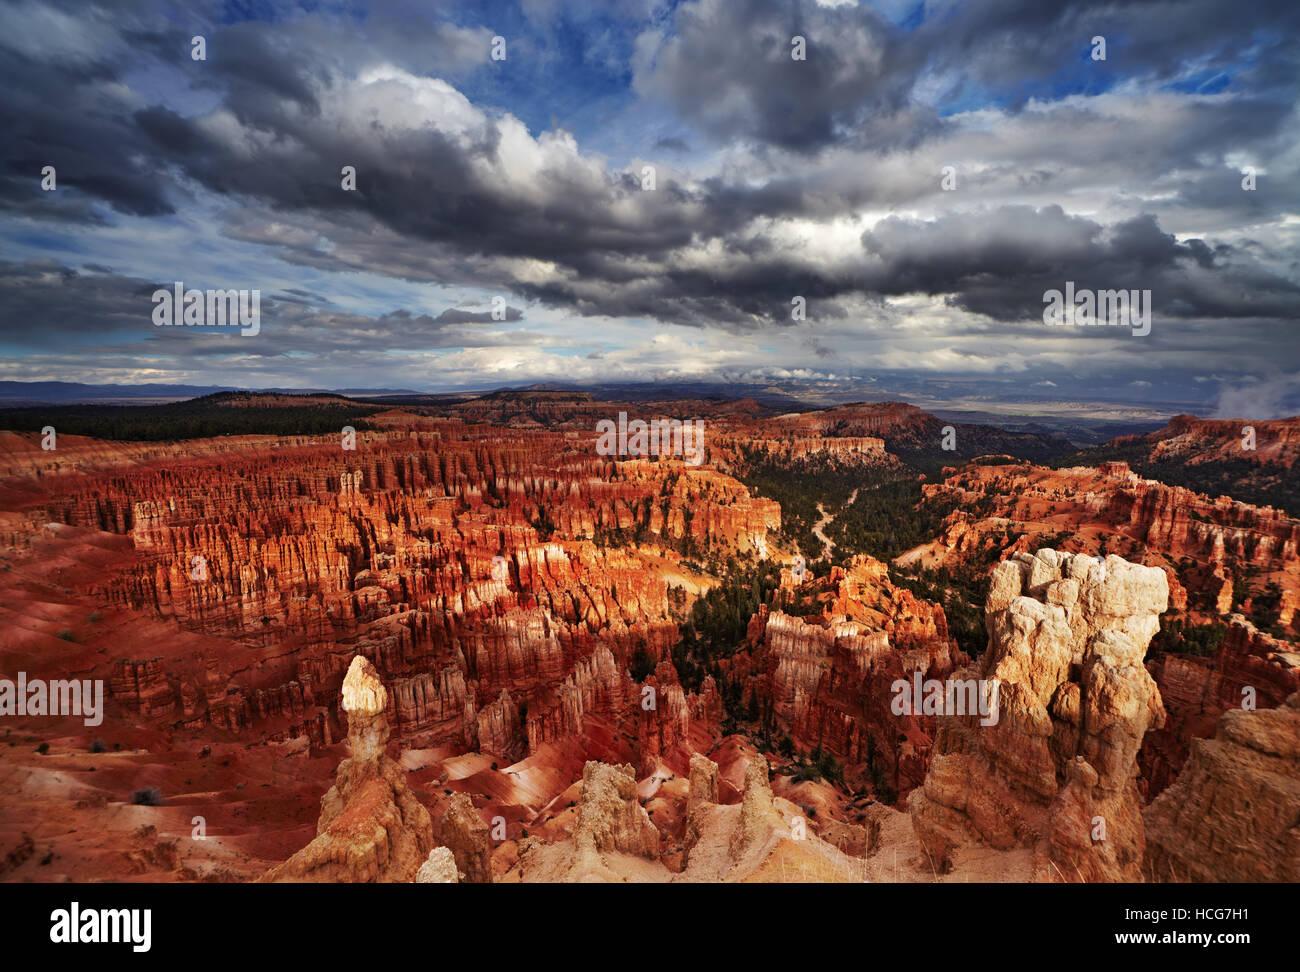 Bryce Canyon, Inspiration Point, Utah, USA Photo Stock